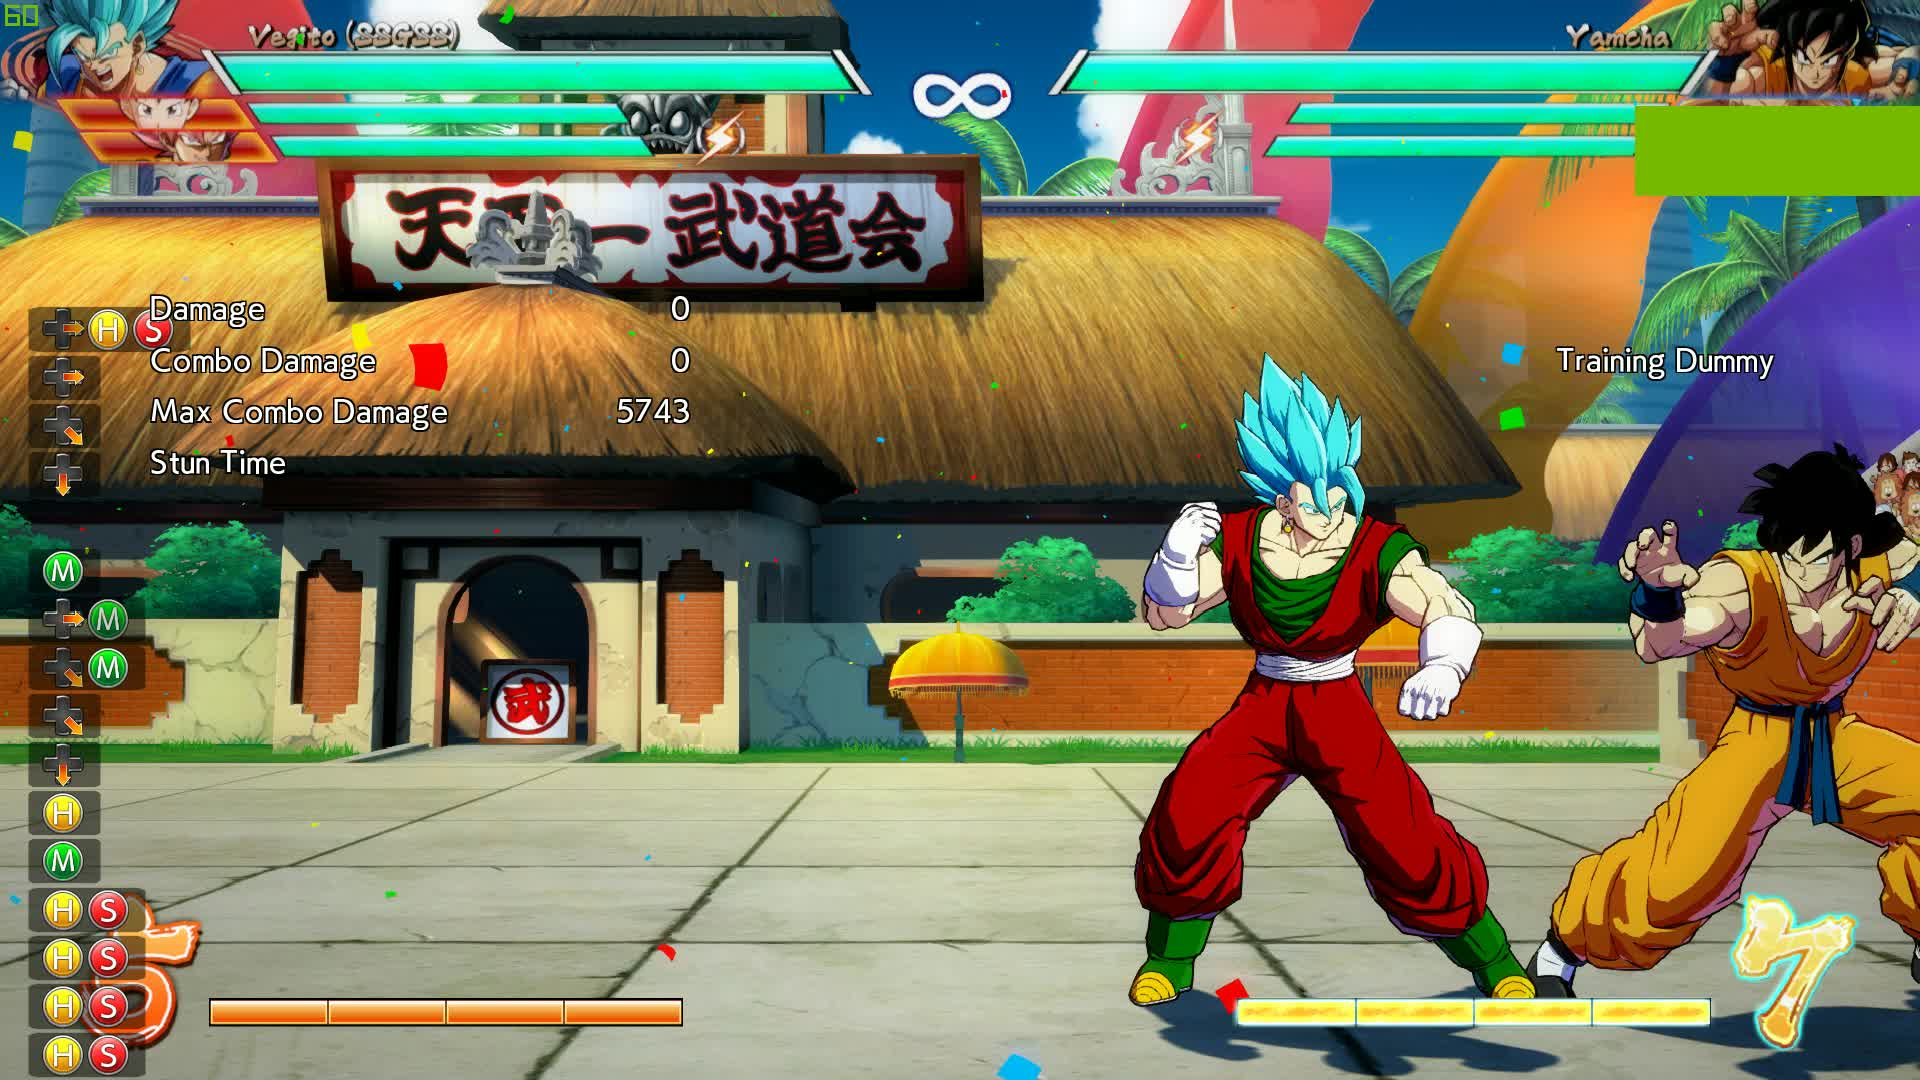 Dragon Ball FighterZ, dbfz, DRAGON BALL FighterZ 2019.04.21 - 14.36.32.04 GIFs